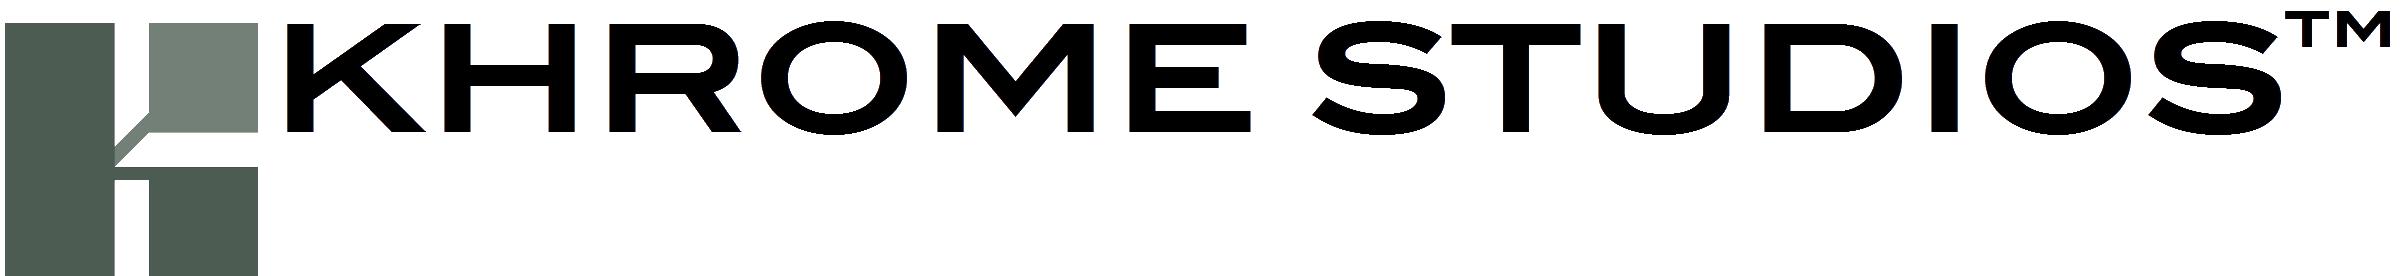 logo of Khrome Studios